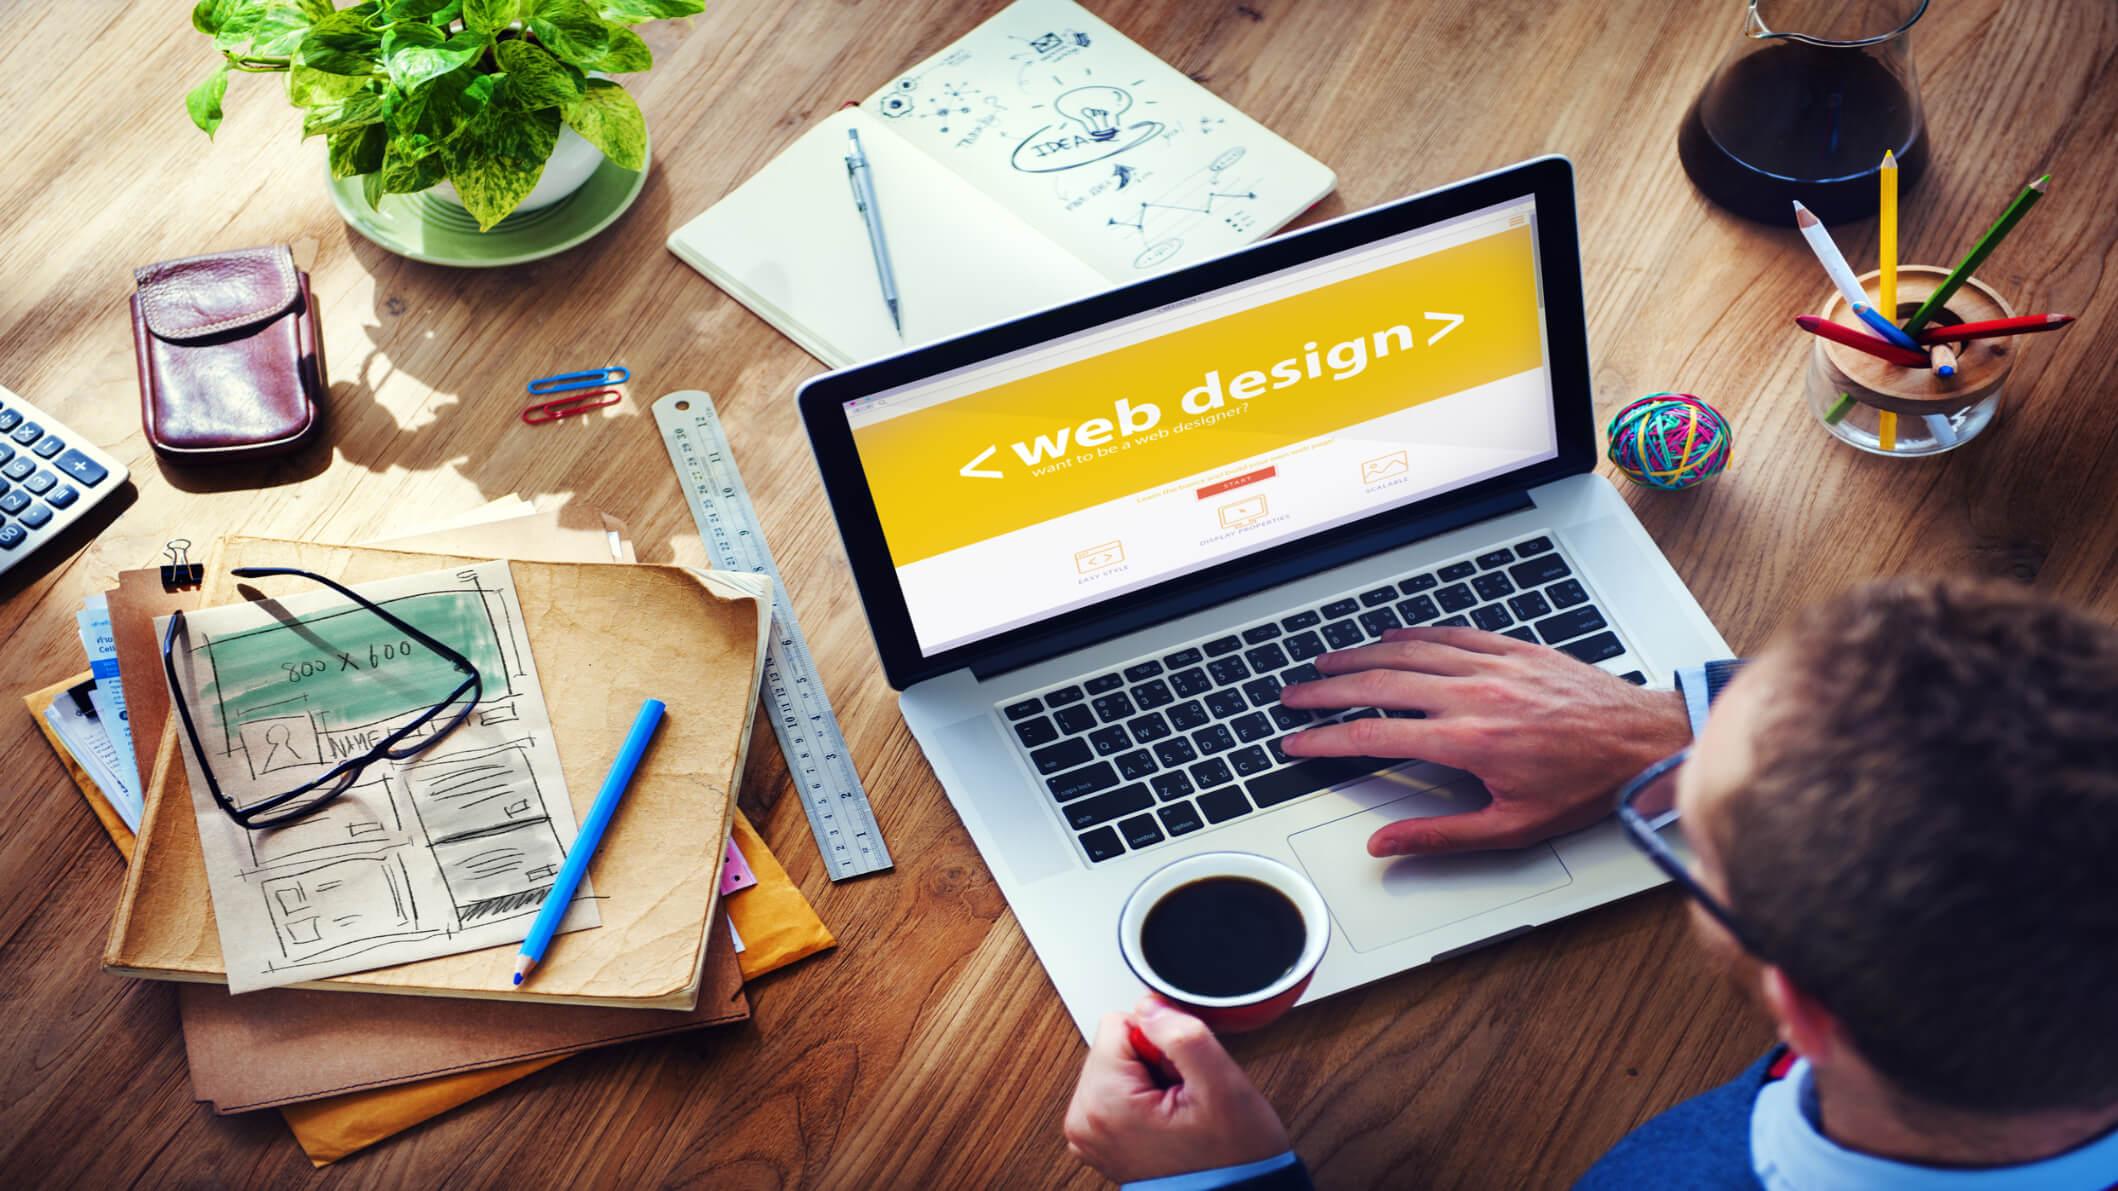 web design code display on screen